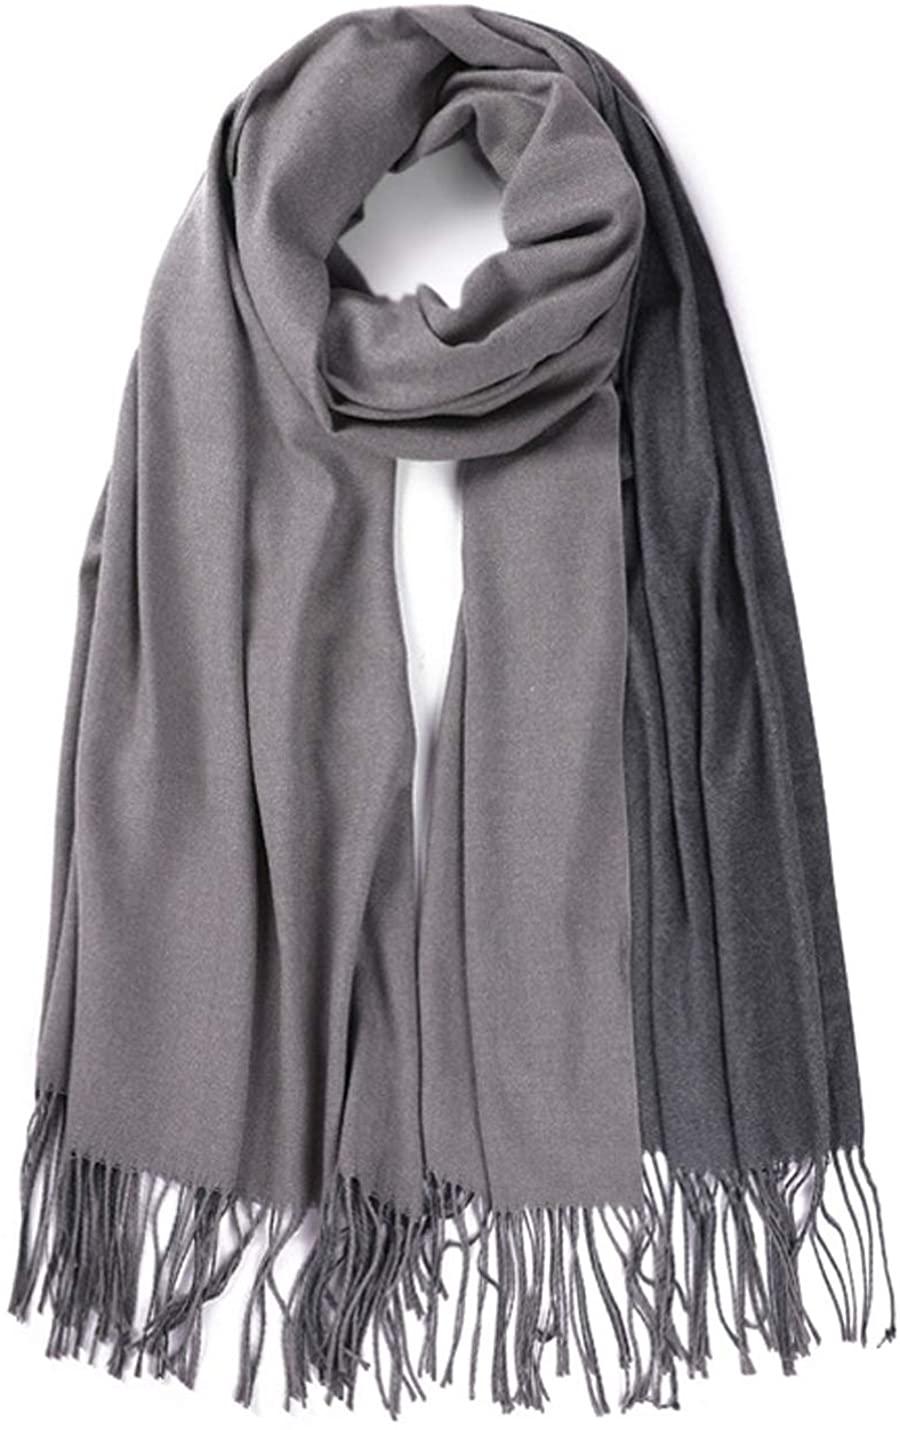 SHAREYOIU Womens Fashion Long Shawl Winter Warm Blanket Scarf